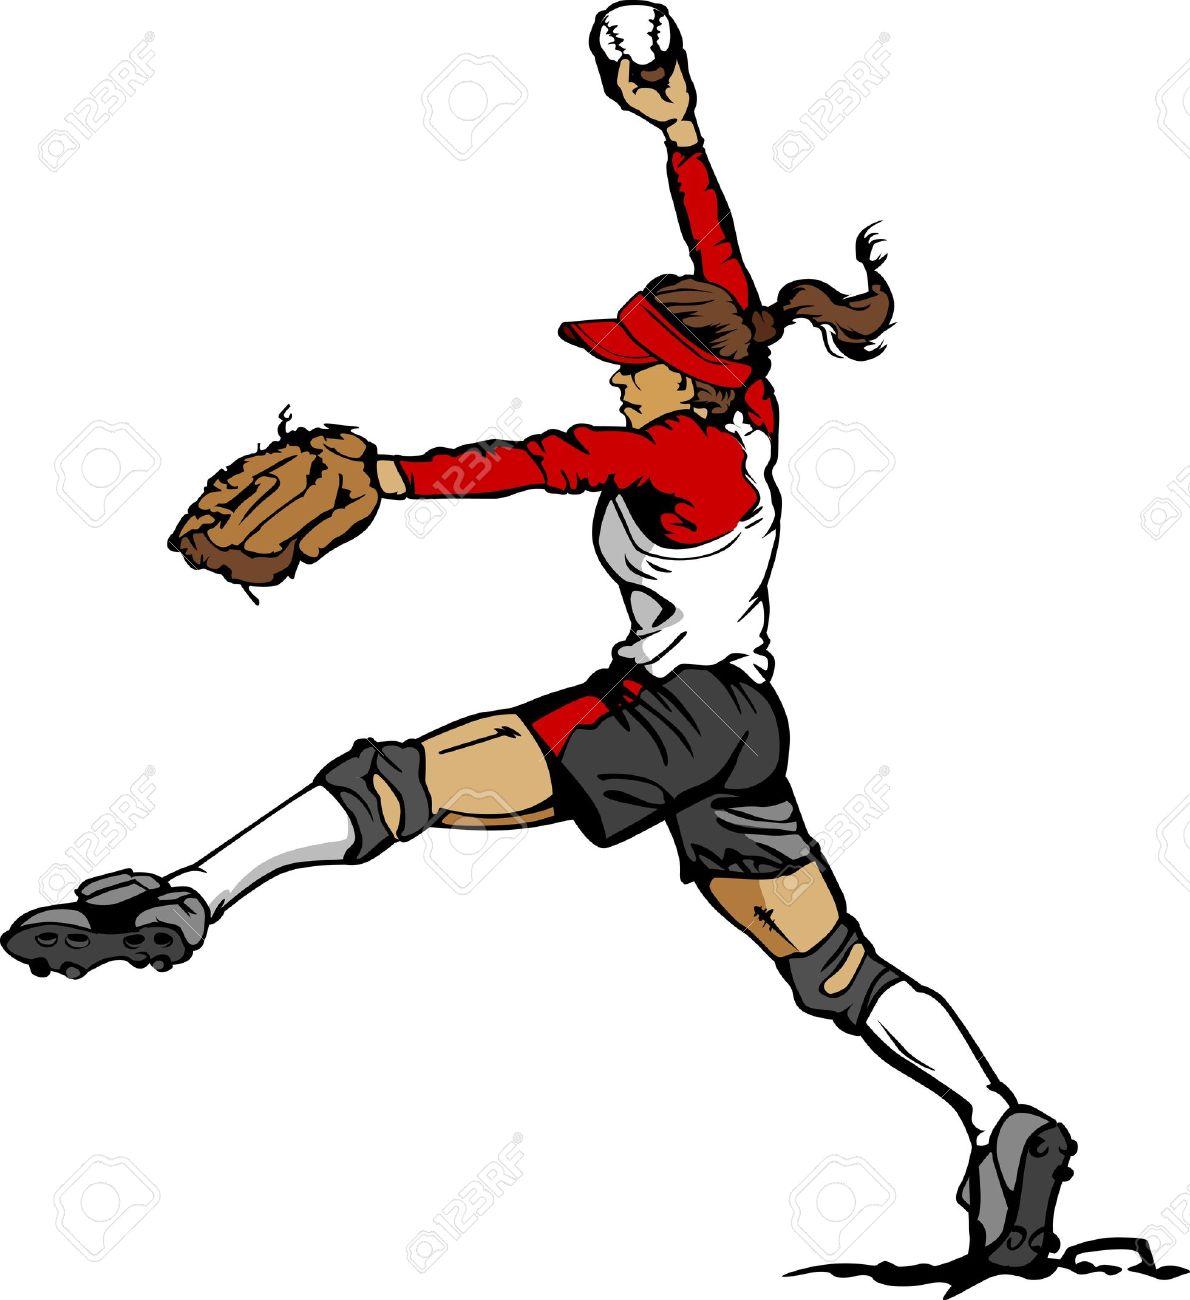 1190x1300 Top 71 Softball Clip Art